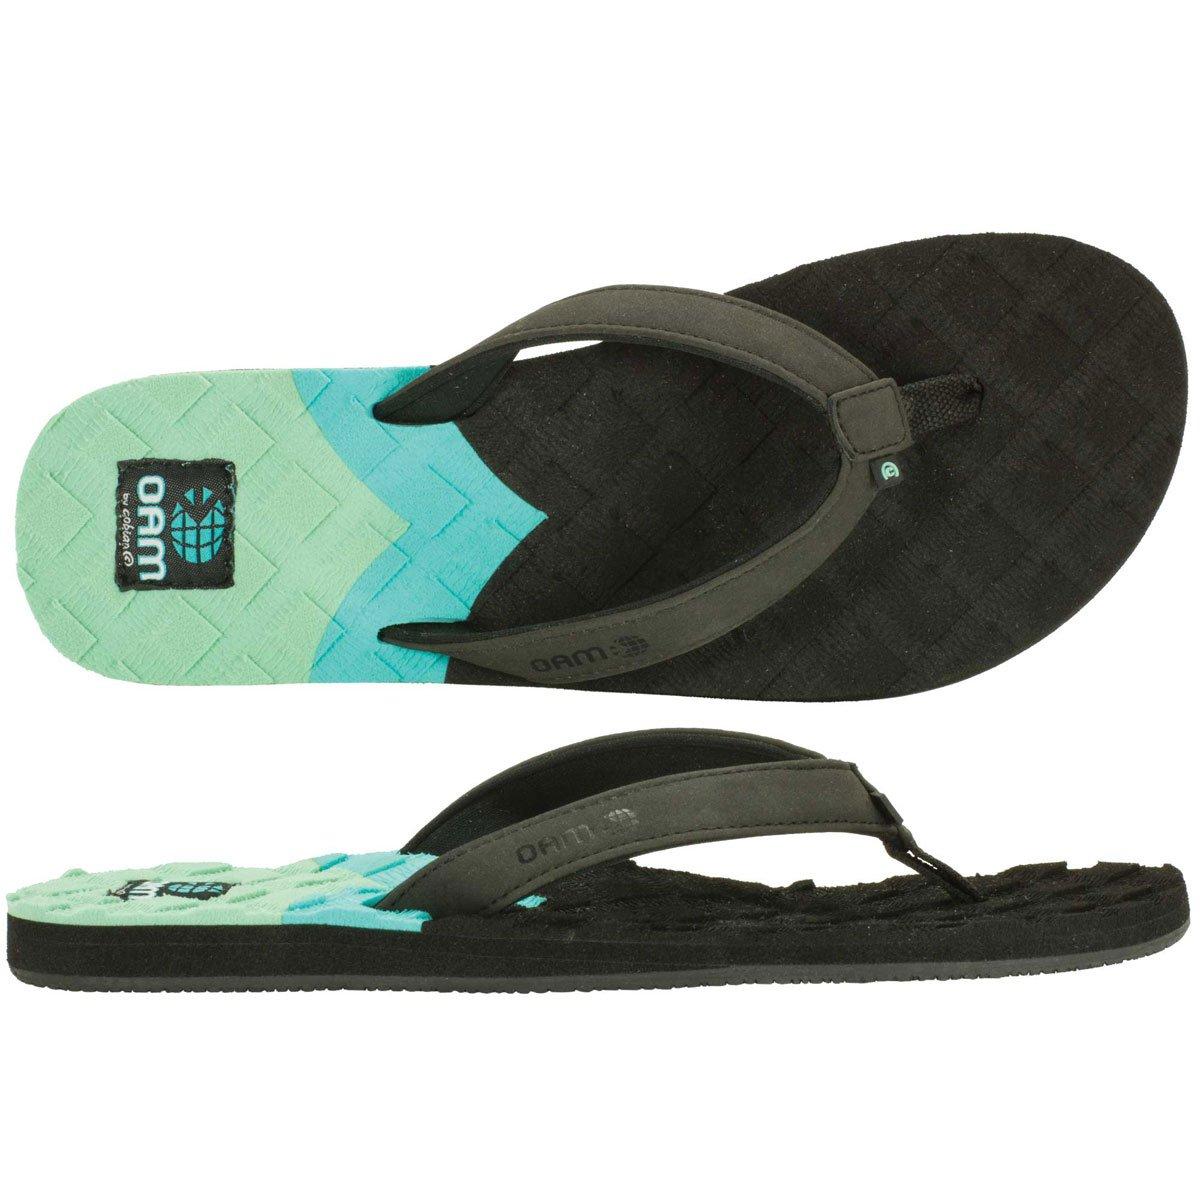 90f27d2fea1c Cobian womens foam flip flop flip flops jpg 1200x1200 Cobian flip flops